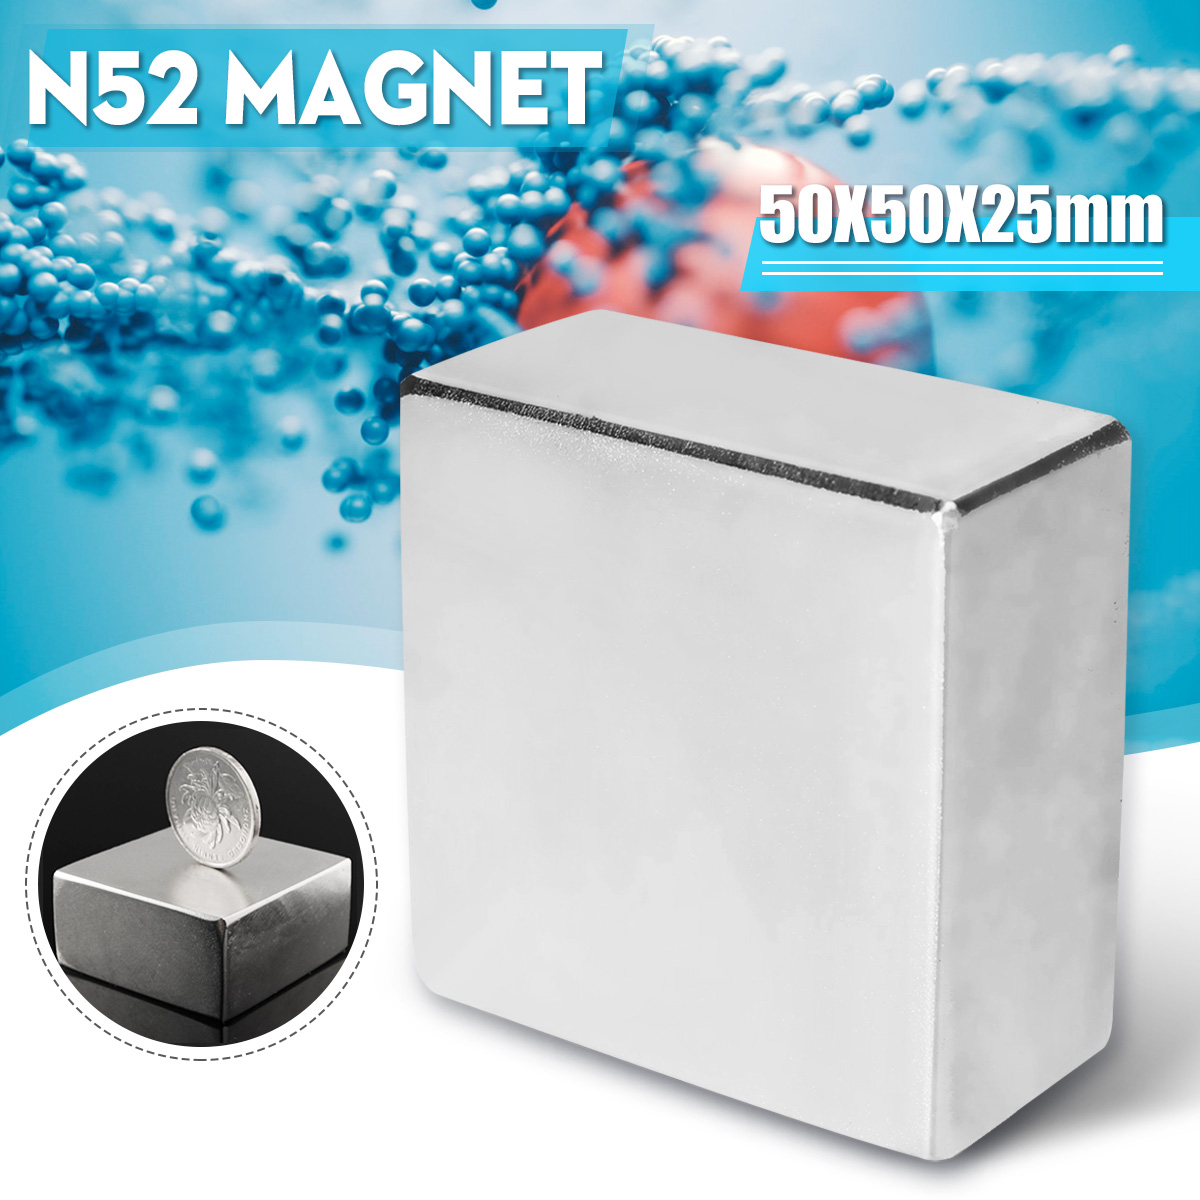 Supers Starke Große N52 Neodym Block Permanent Magnet der Seltenen Erde 50X50X25mm